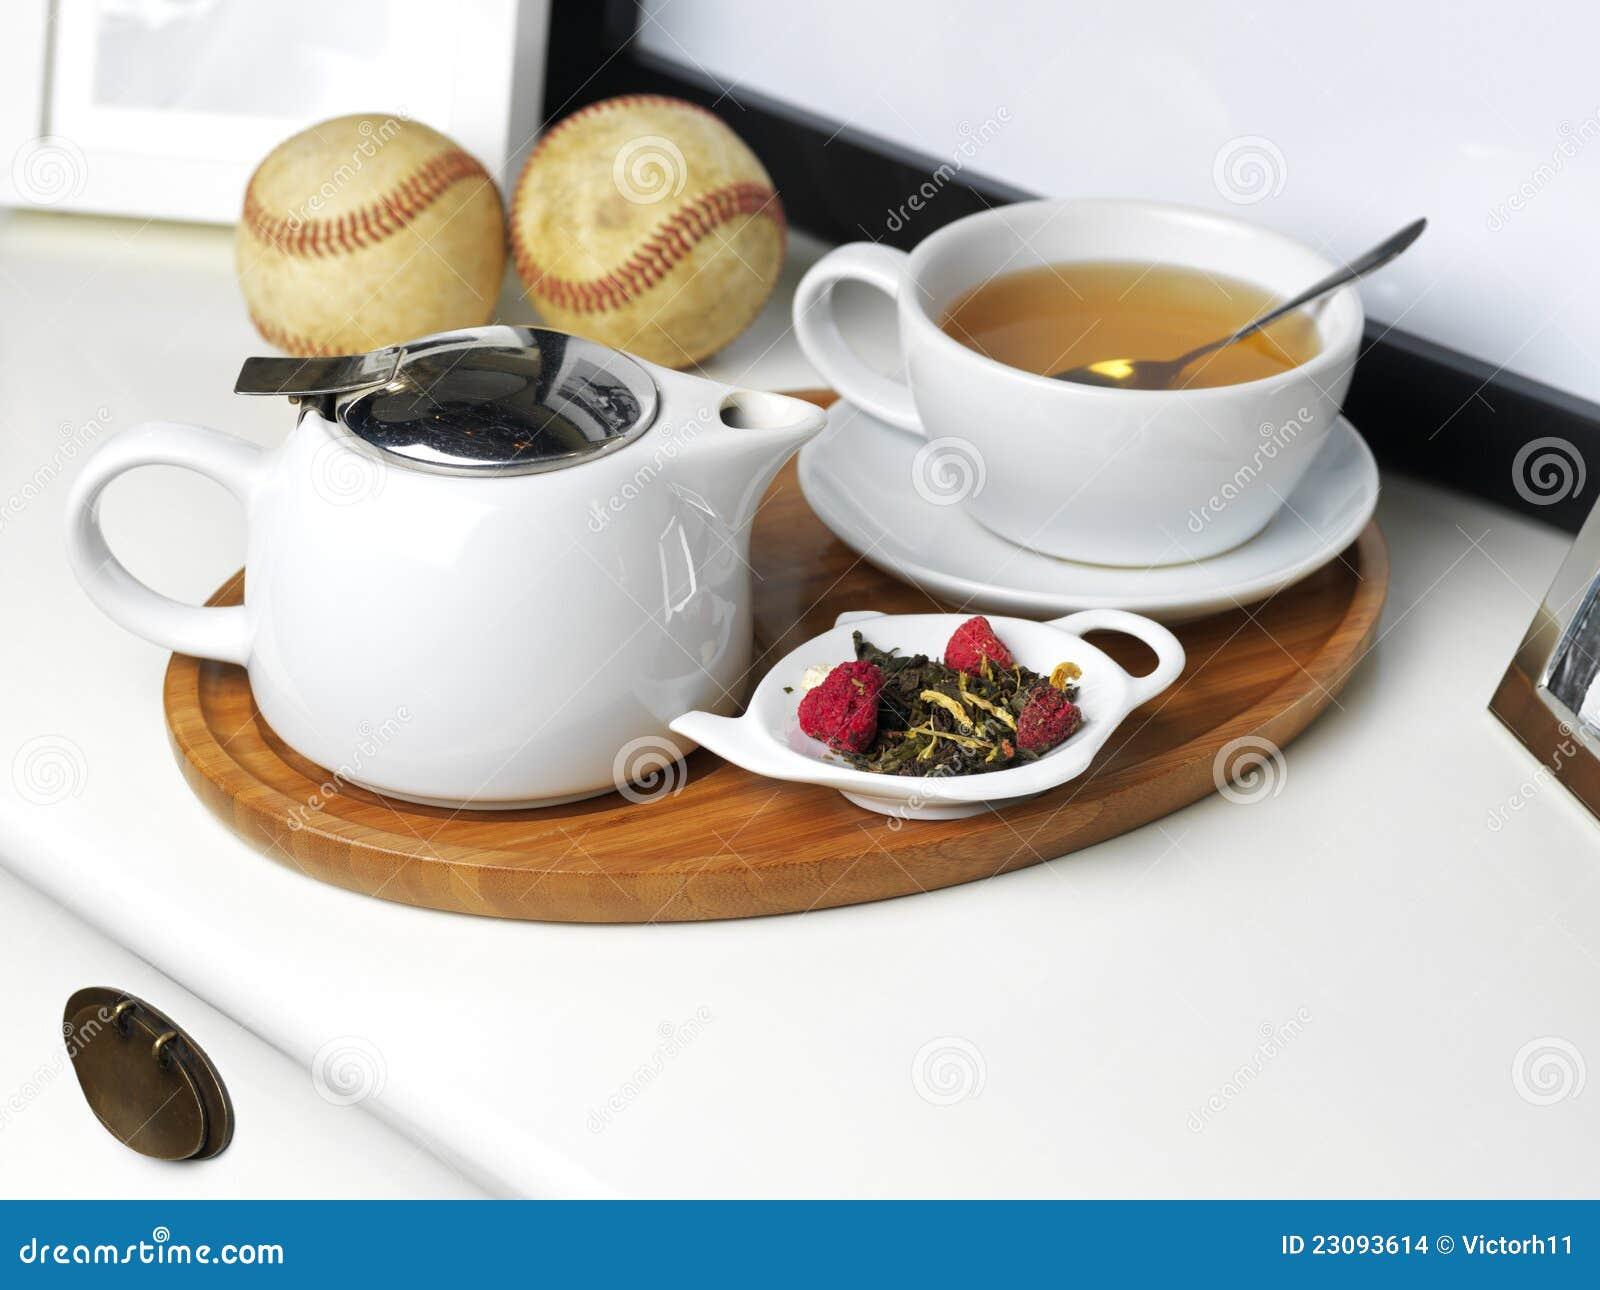 english tea time stock images image 23093614. Black Bedroom Furniture Sets. Home Design Ideas